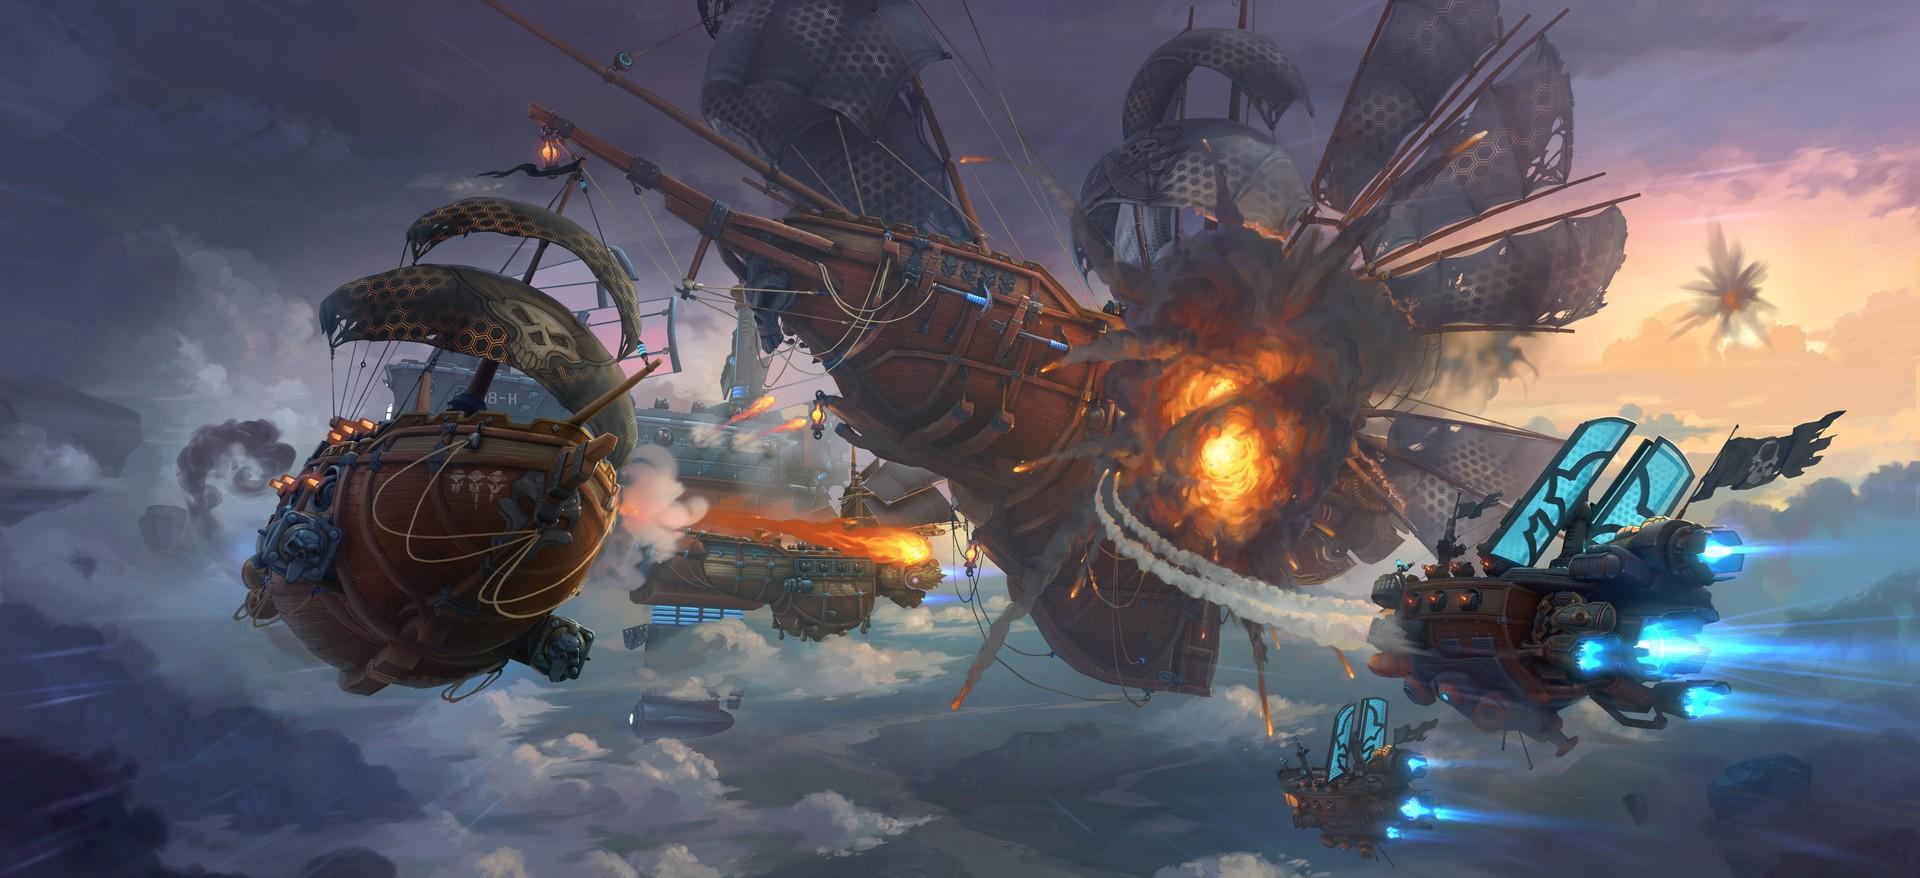 1042-skyship-battle-ivan-smirnov